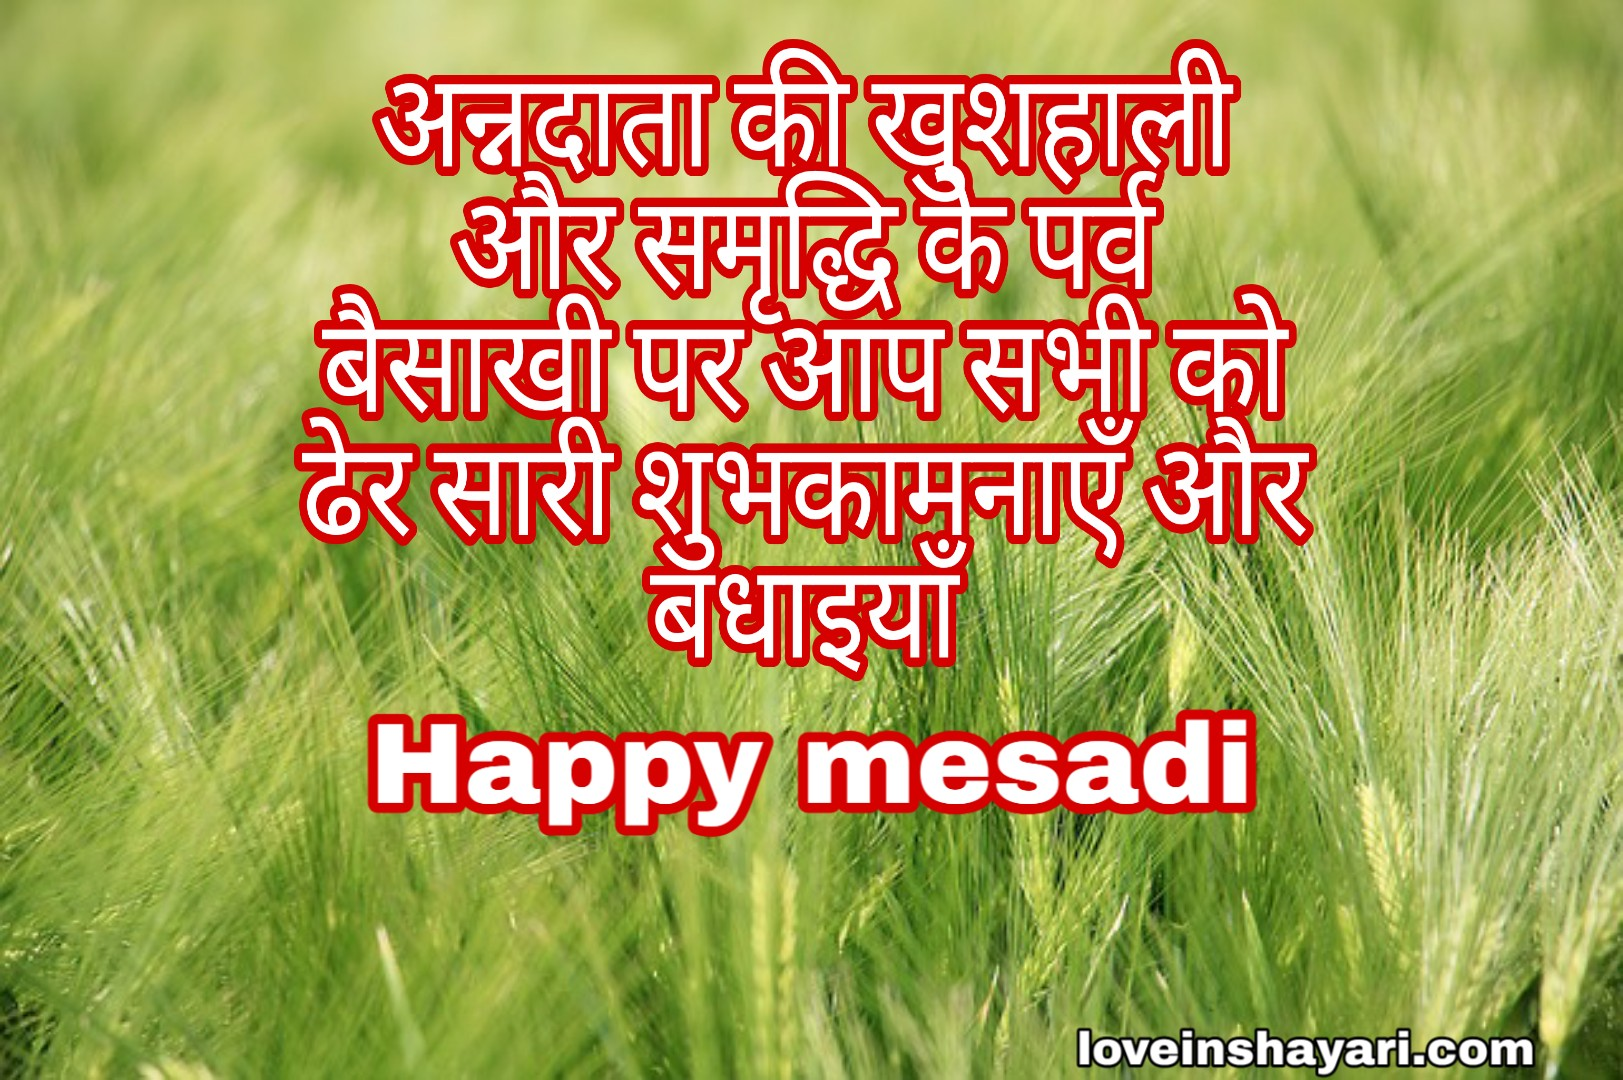 Mesadi vaisakhadi wishes shayari images messages